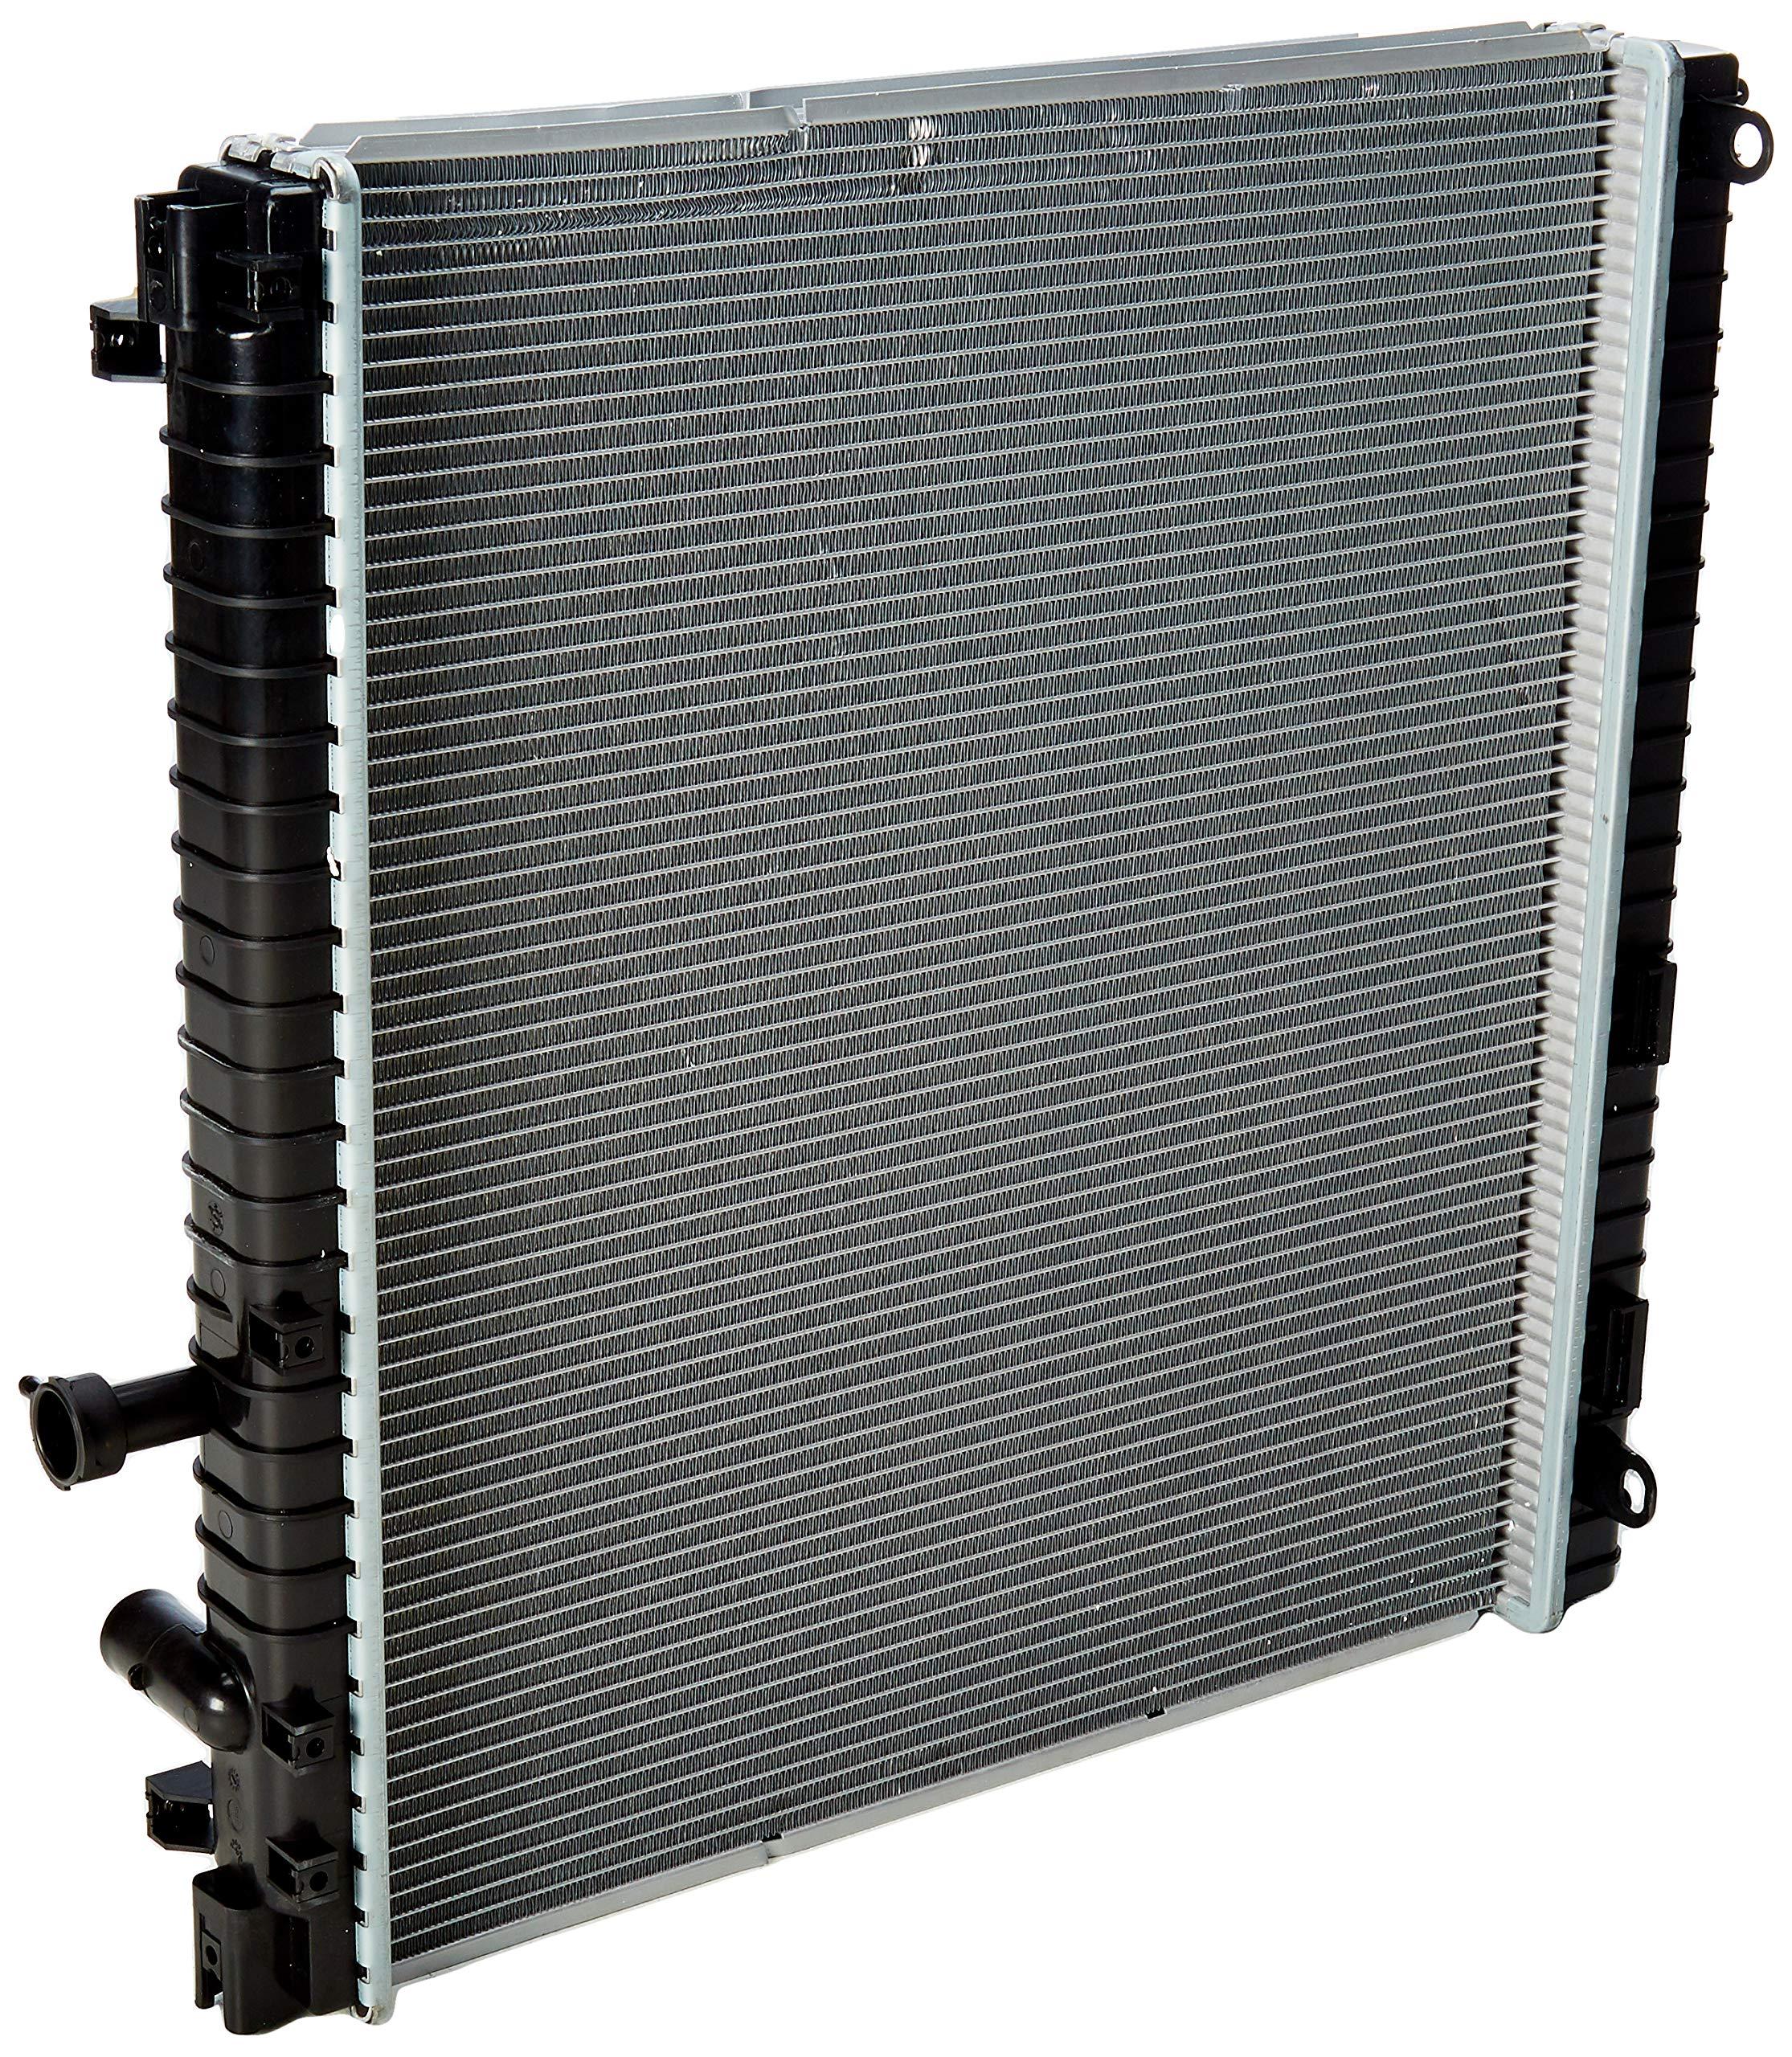 CSF 3693 Radiator by CSF